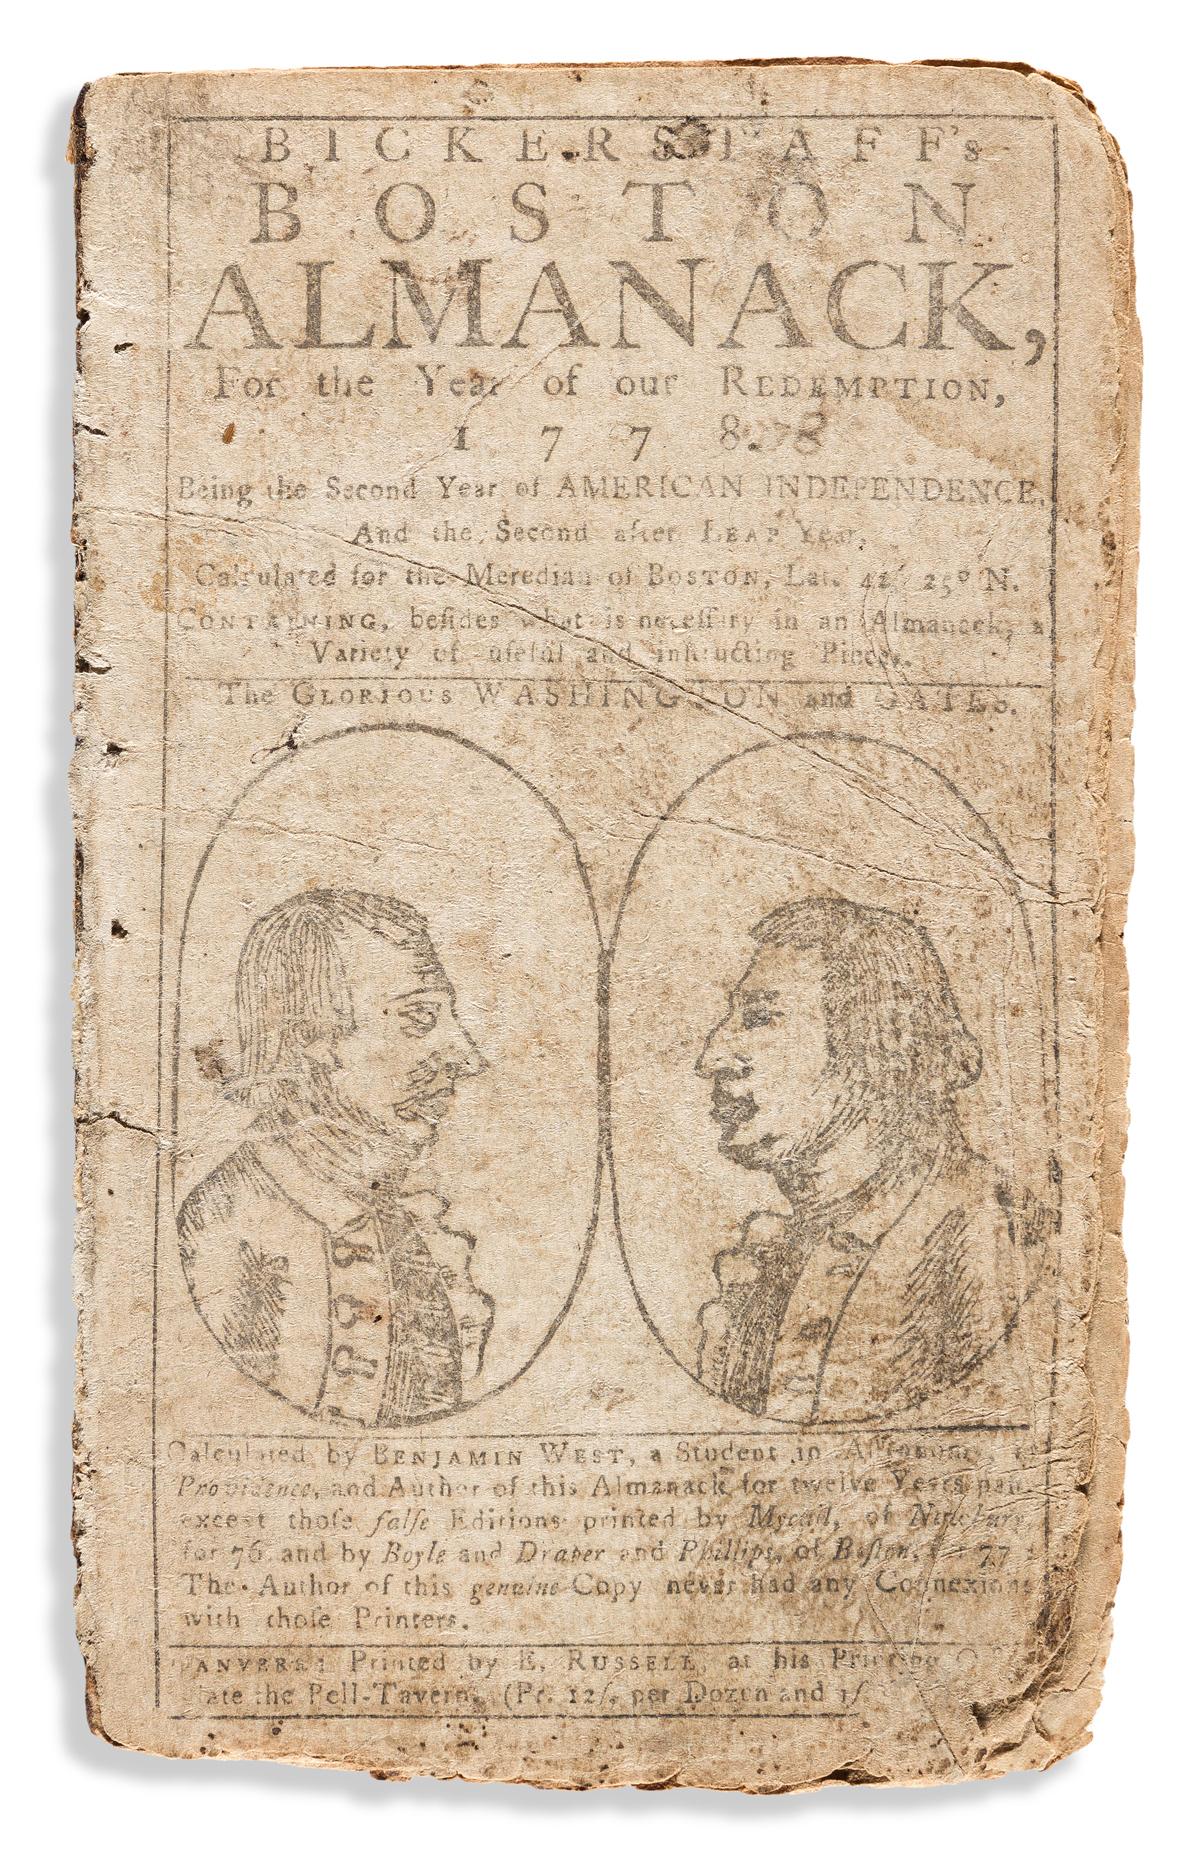 (WASHINGTON.) Benjamin West. Bickerstaffs Boston Almanack, for the Year of our Redemption, 1778.